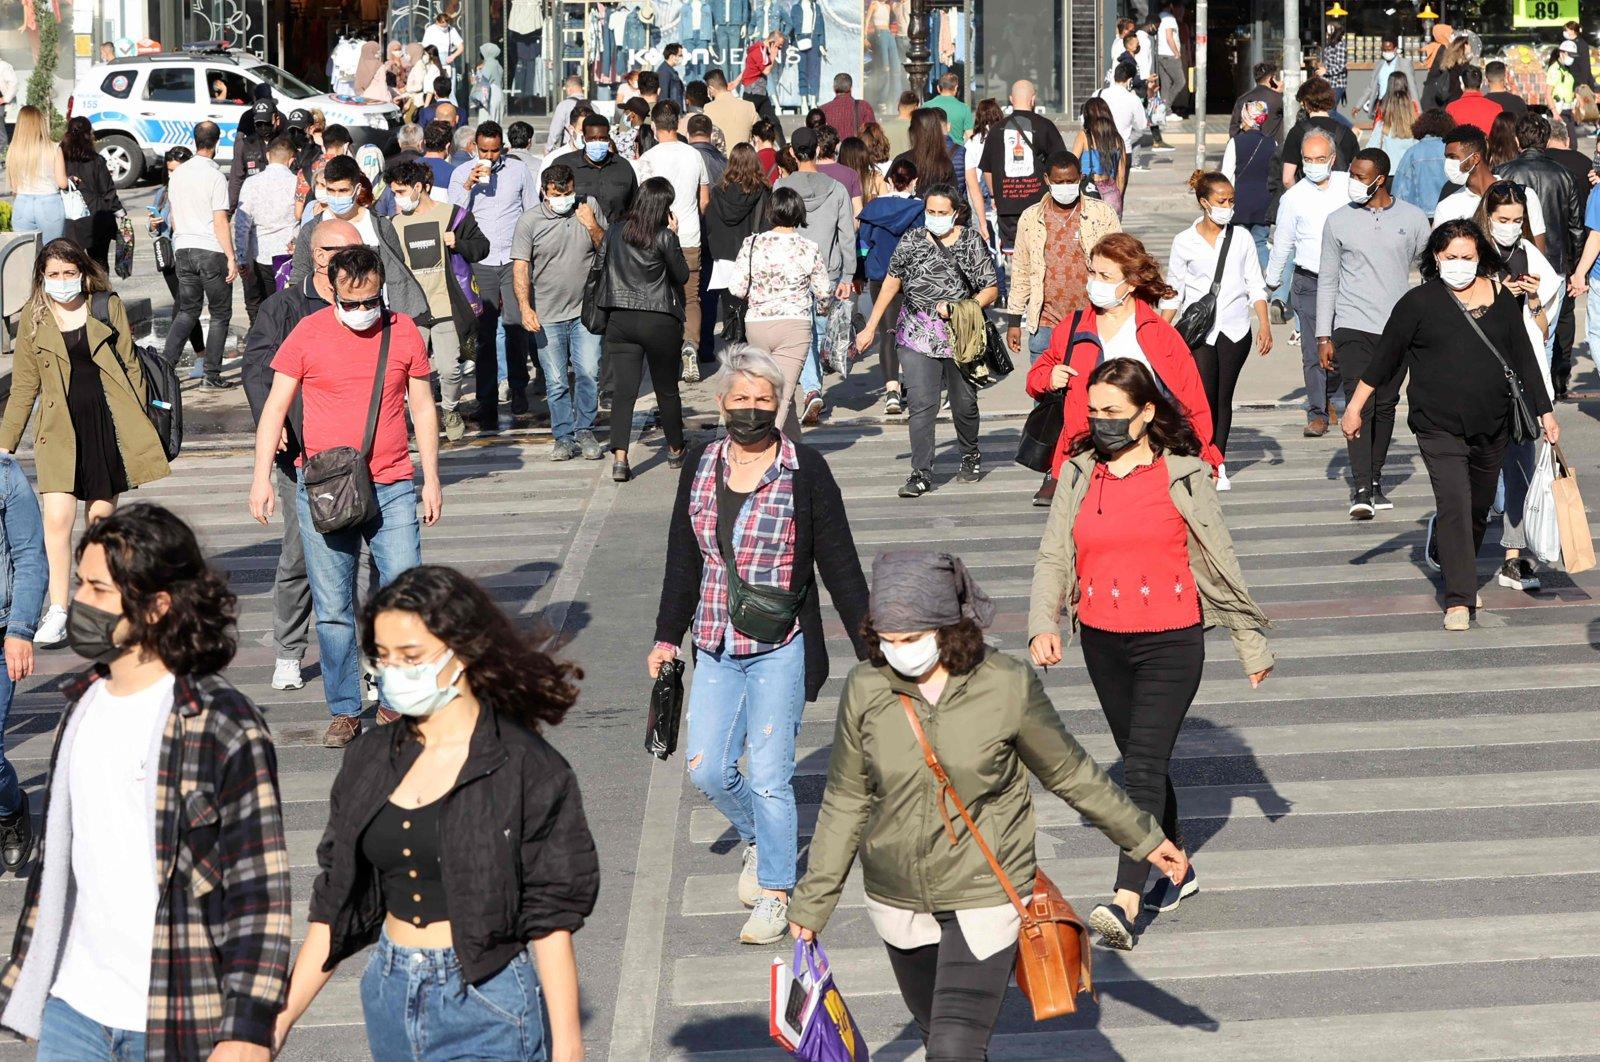 People walk on a street in the capital Ankara, Turkey, May 17, 2021. (AFP Photo)